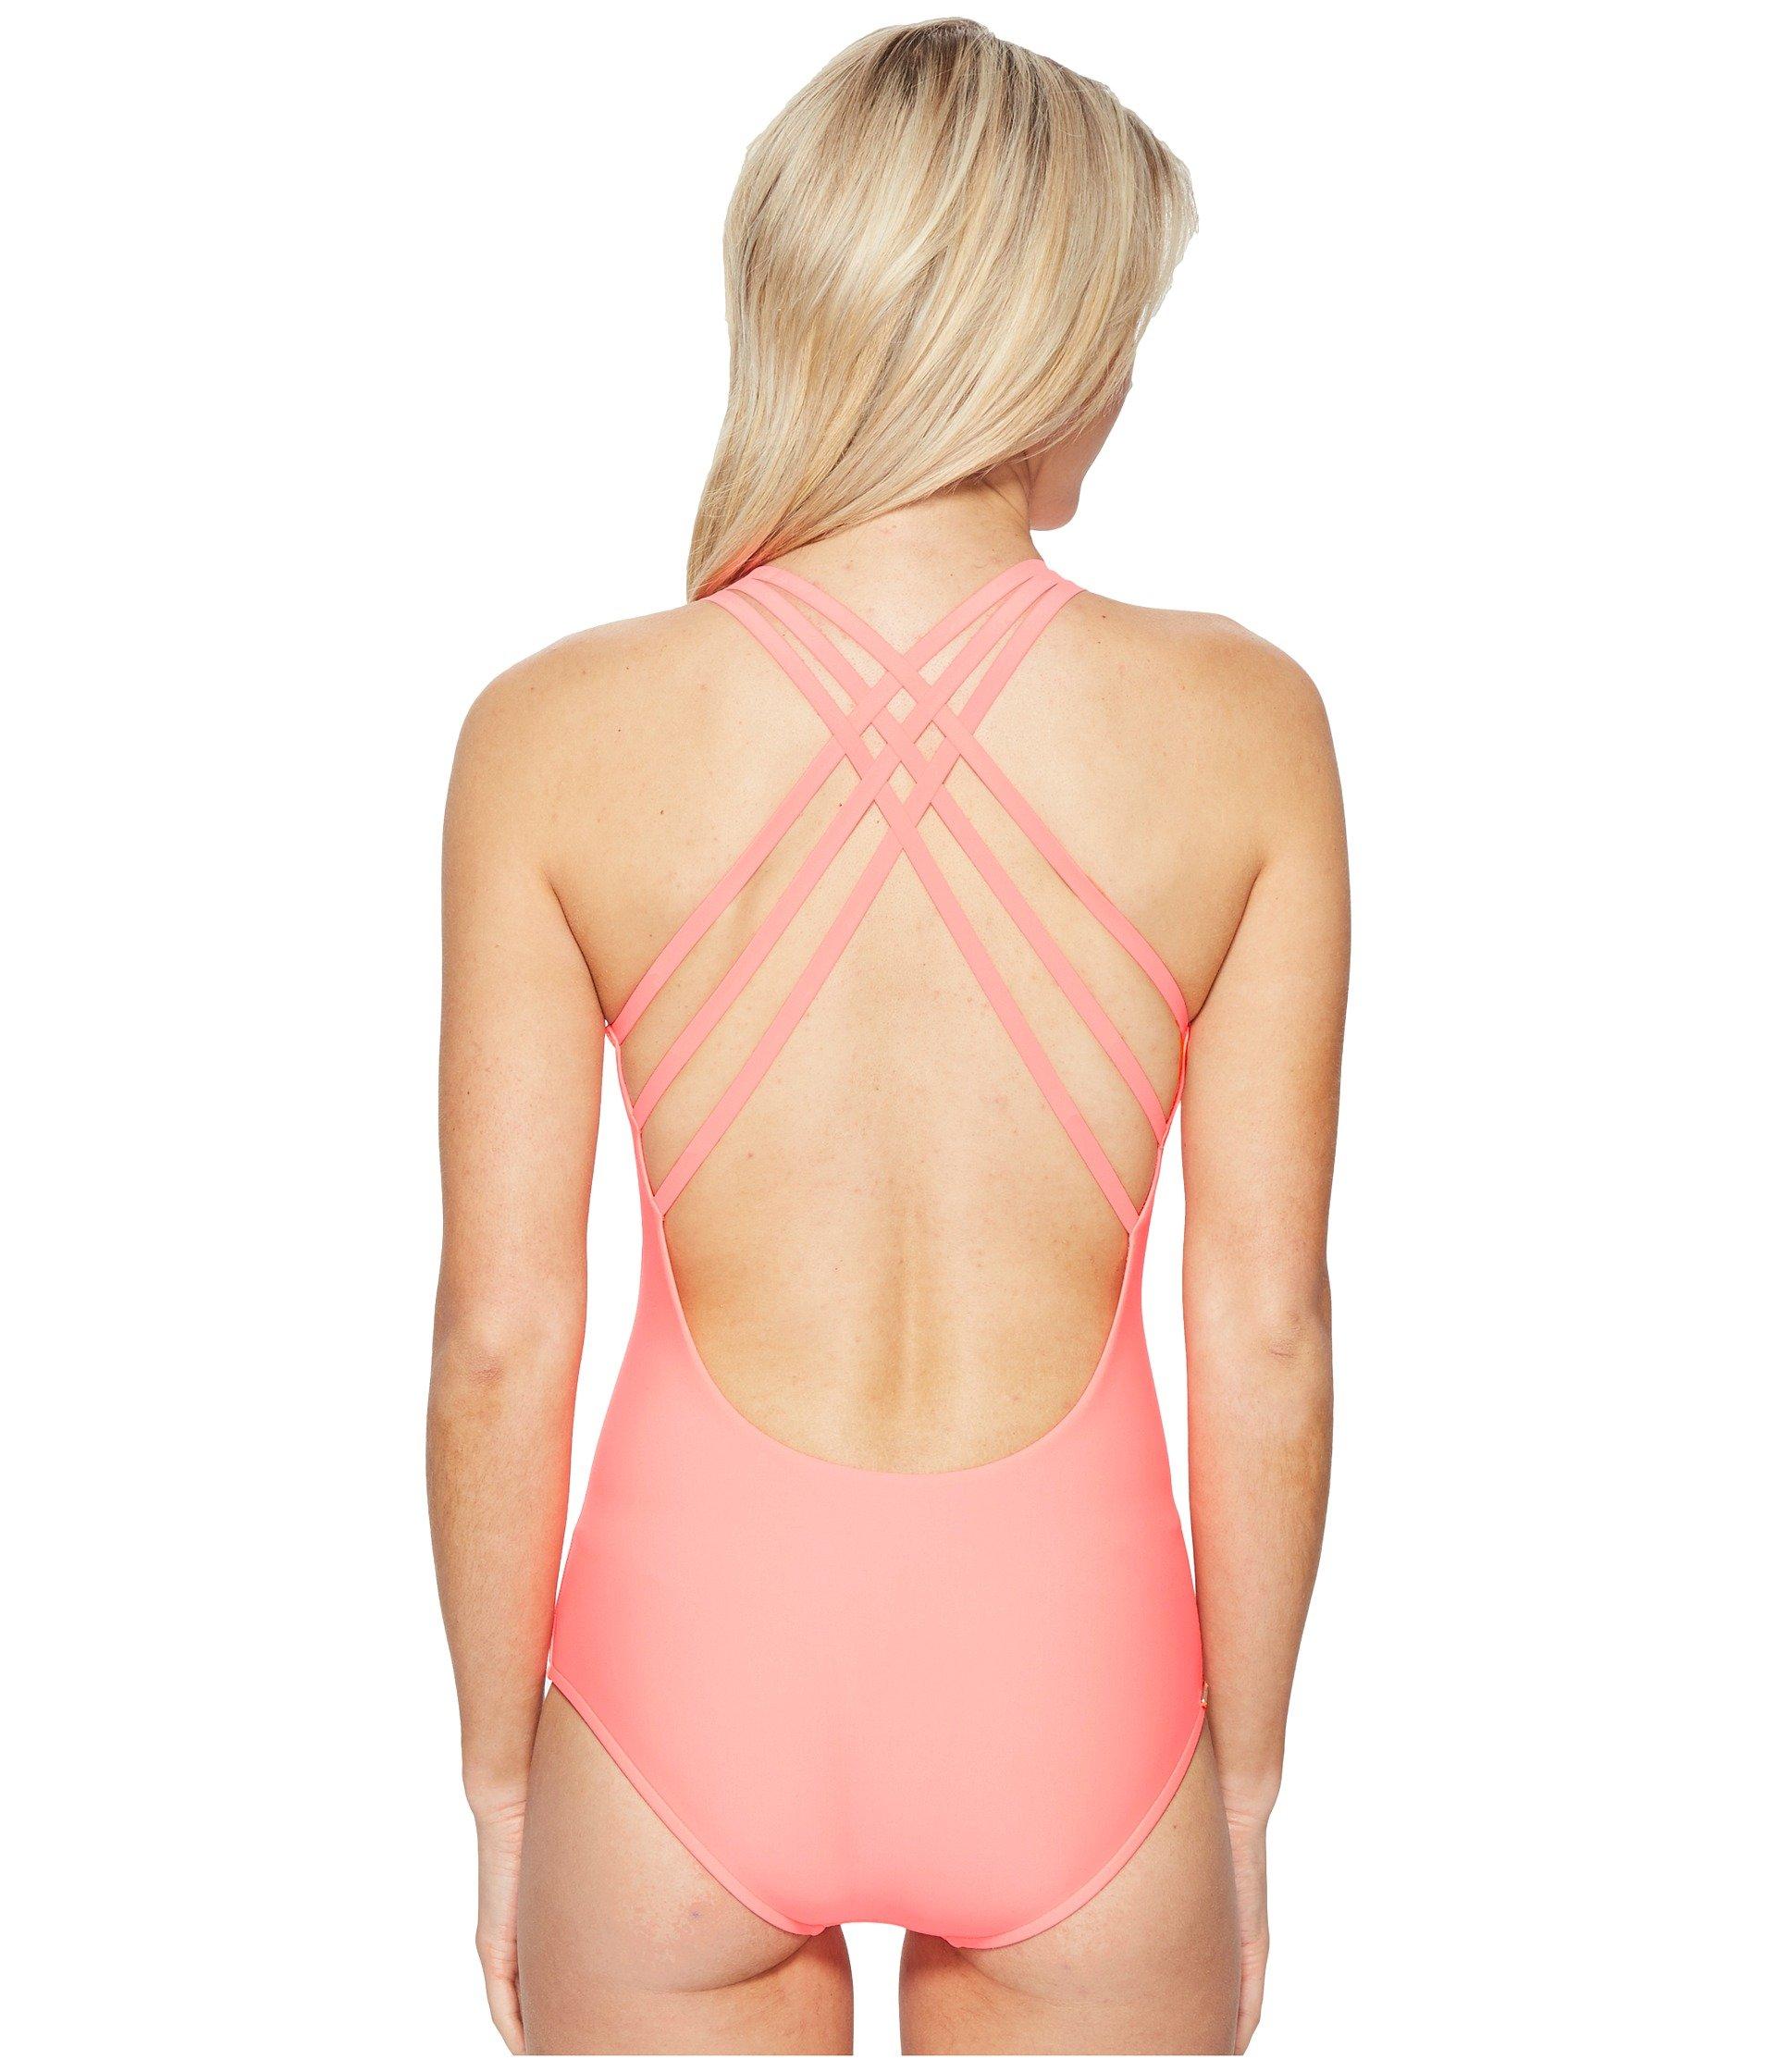 Body Glove Women's Smoothies Crossroads One-Piece Vivo Swimsuit